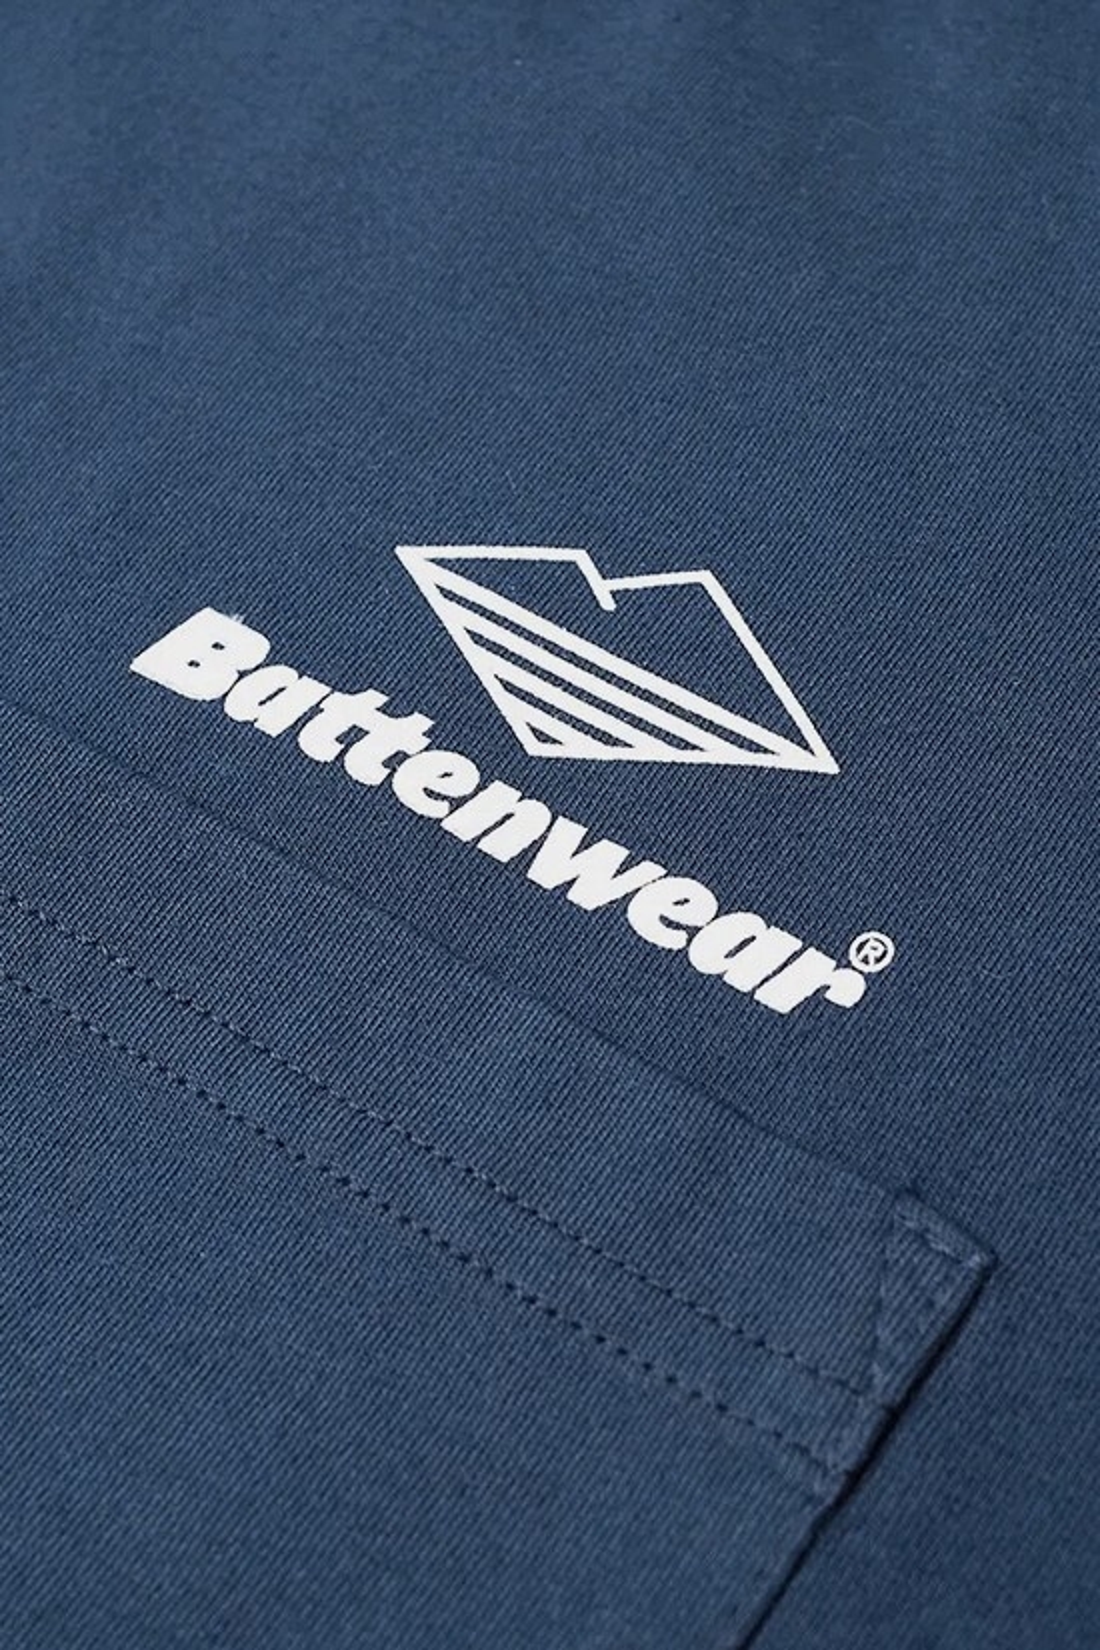 BATTENWEAR / Team l/s basic pocket tee Navy